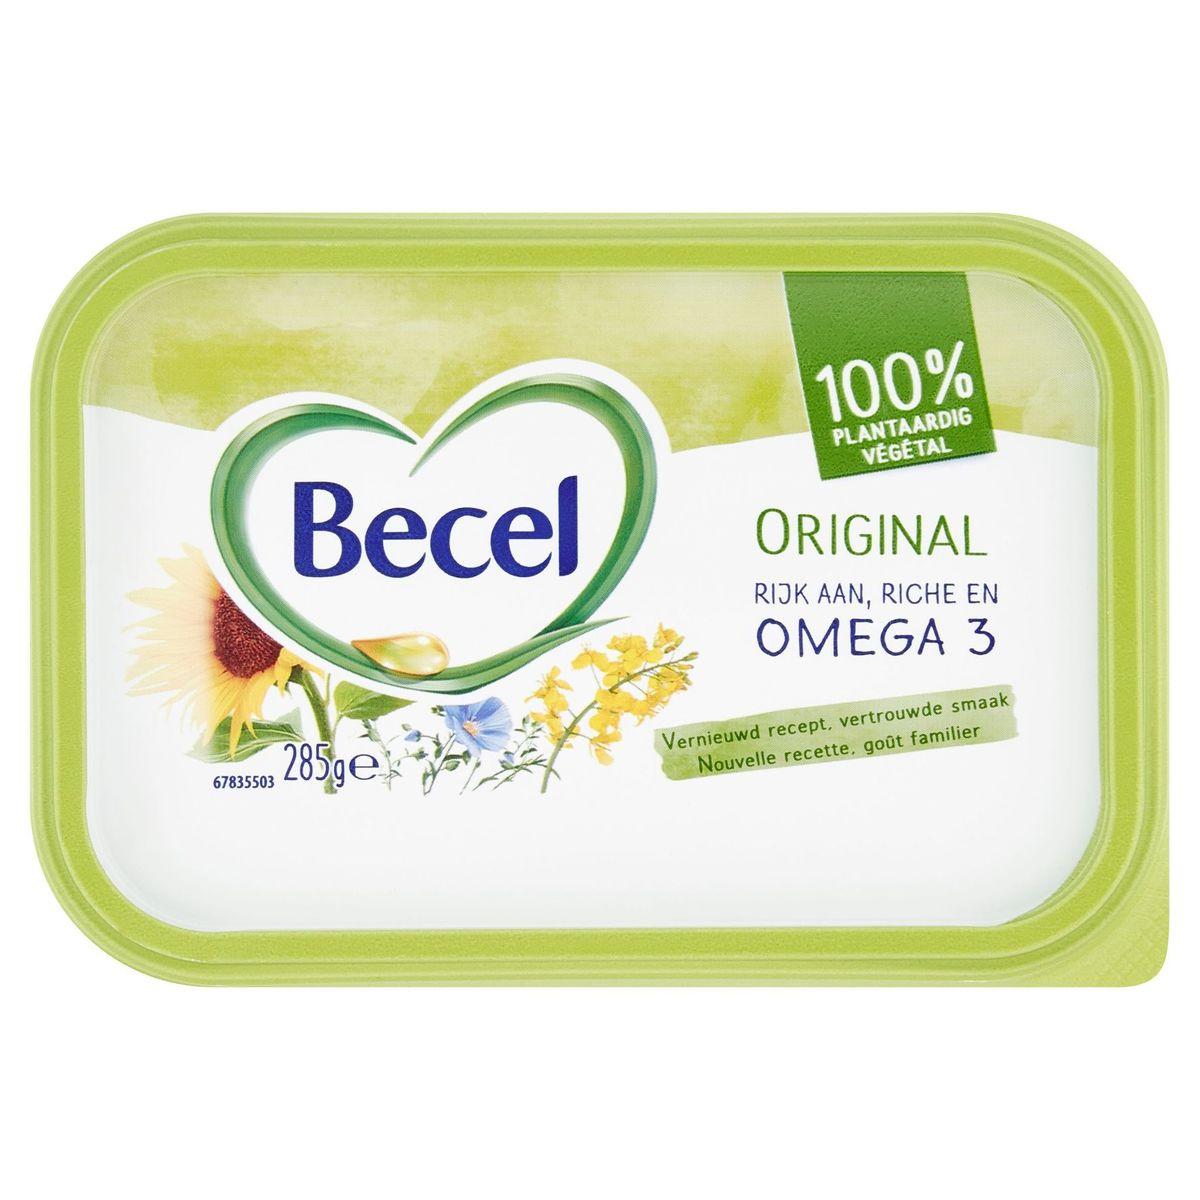 Becel Original 285 g